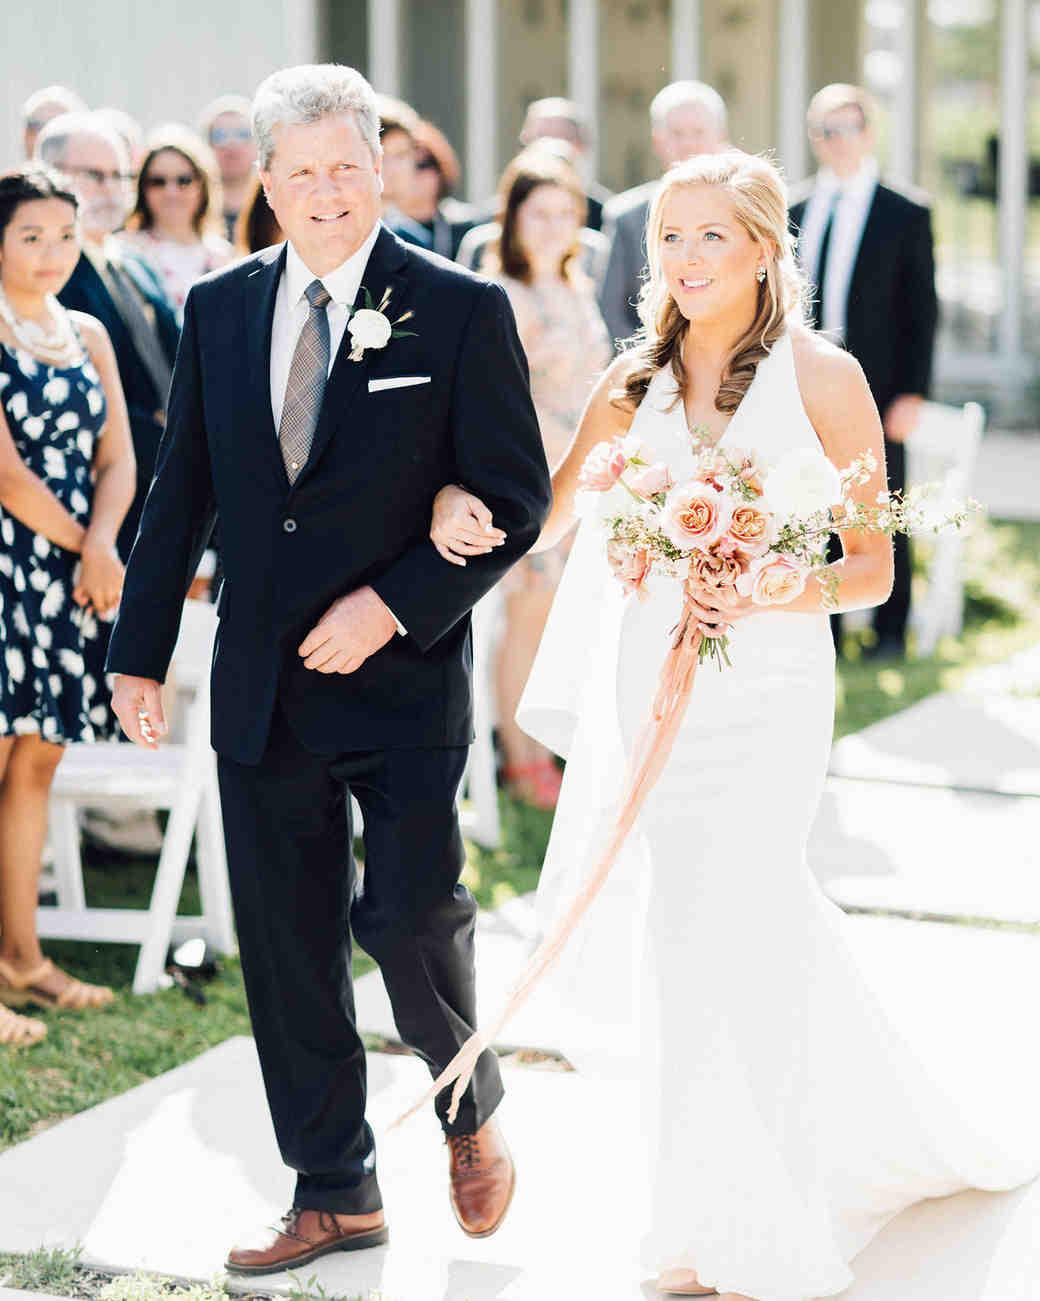 amanda chuck wedding processional bride and father